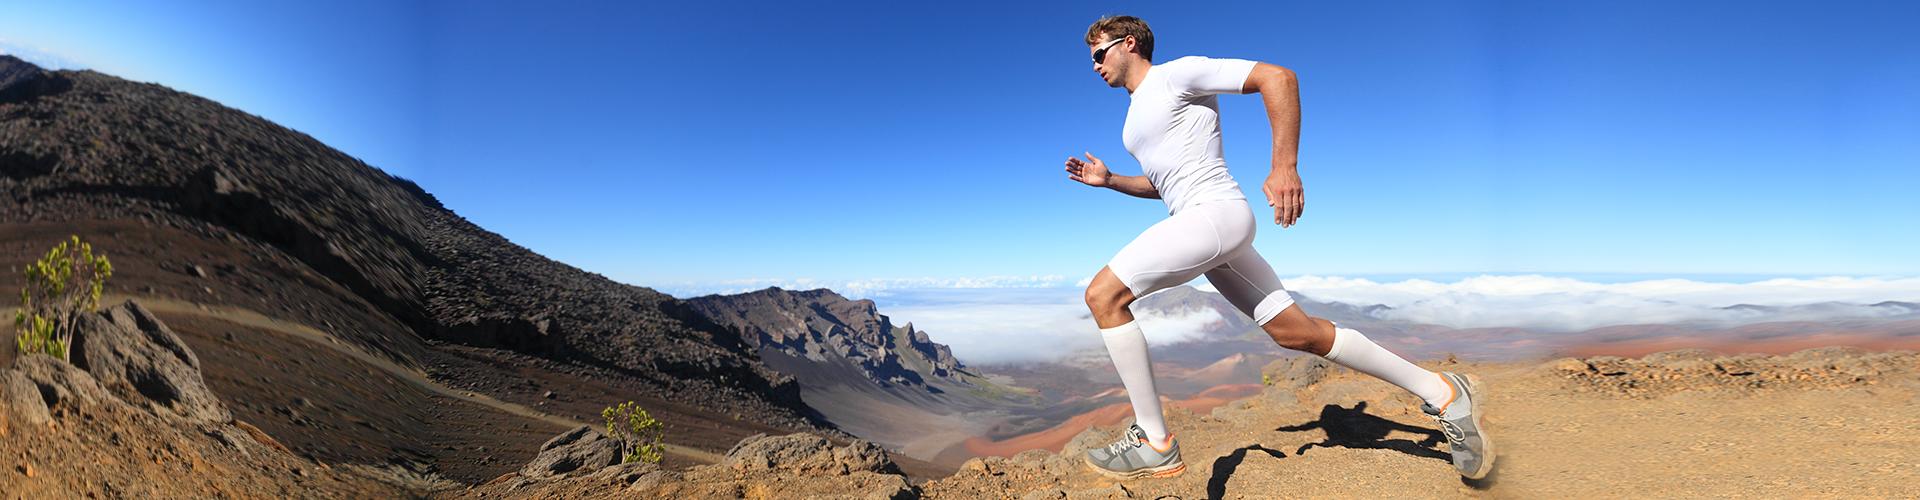 runner_mountains_wide